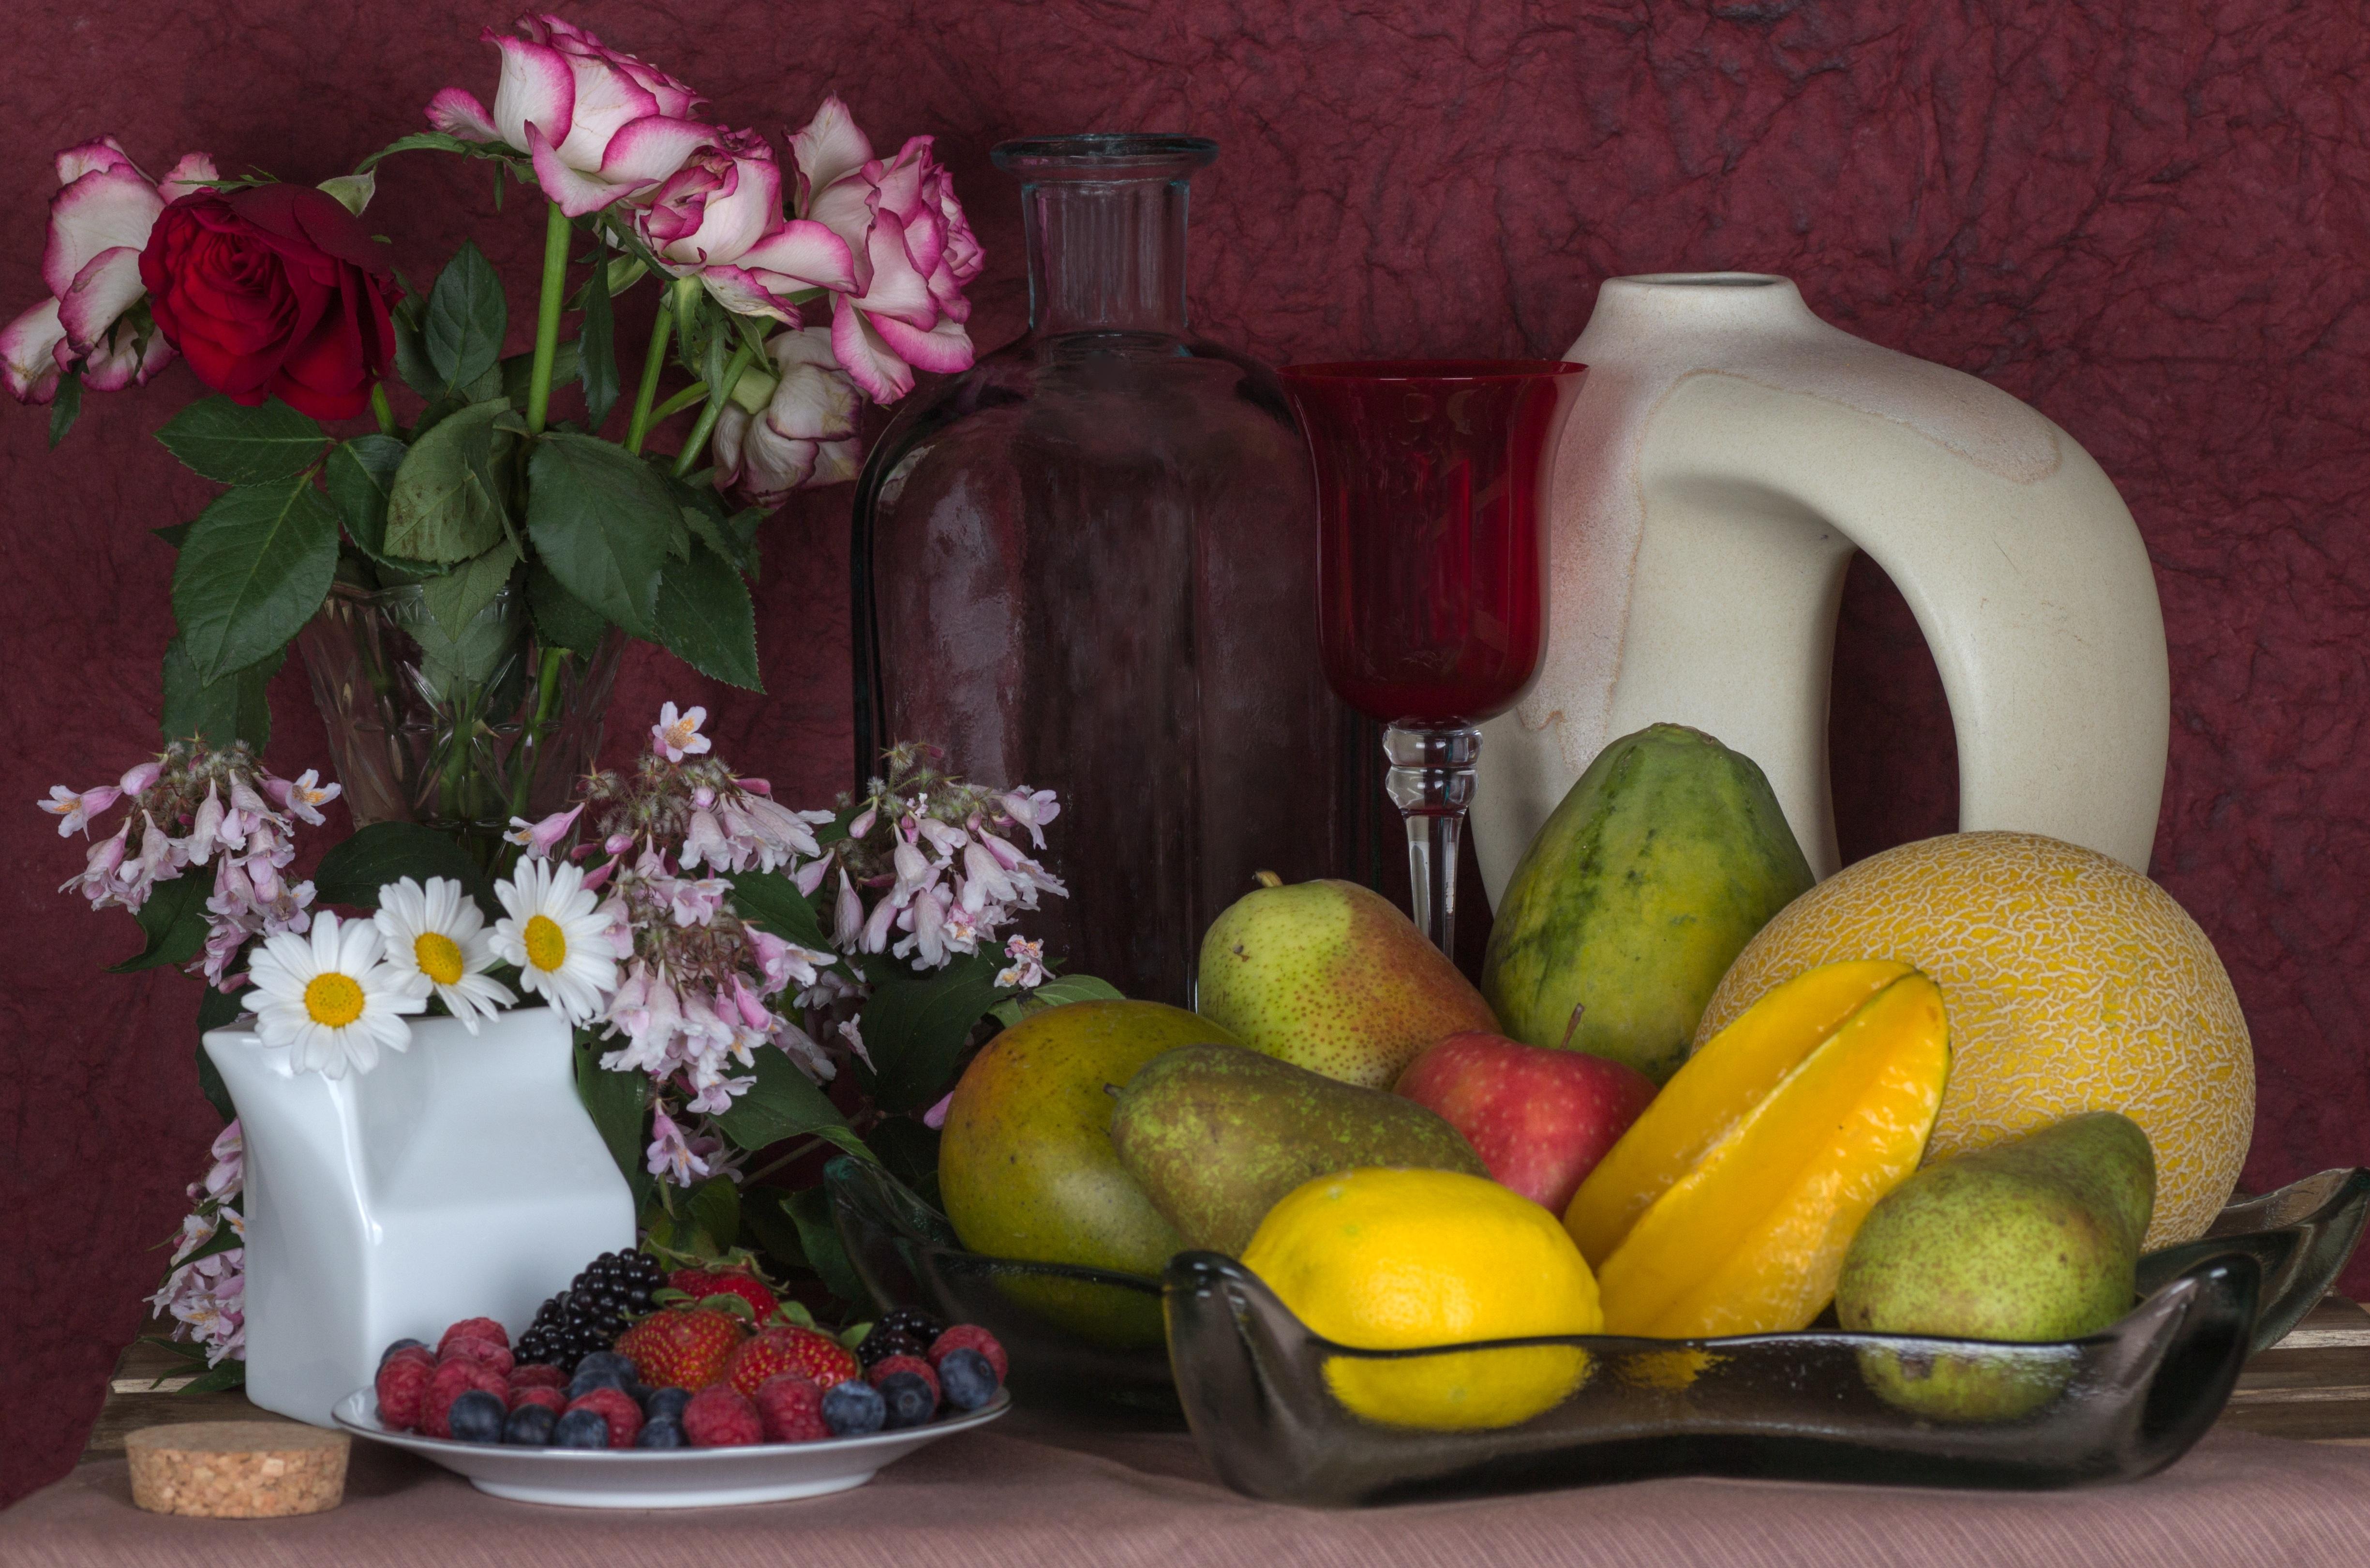 Apple Plant Fruit Flower Meal Food Produce Still Life Artwork Painting Flowers Roses Bowl Floristry